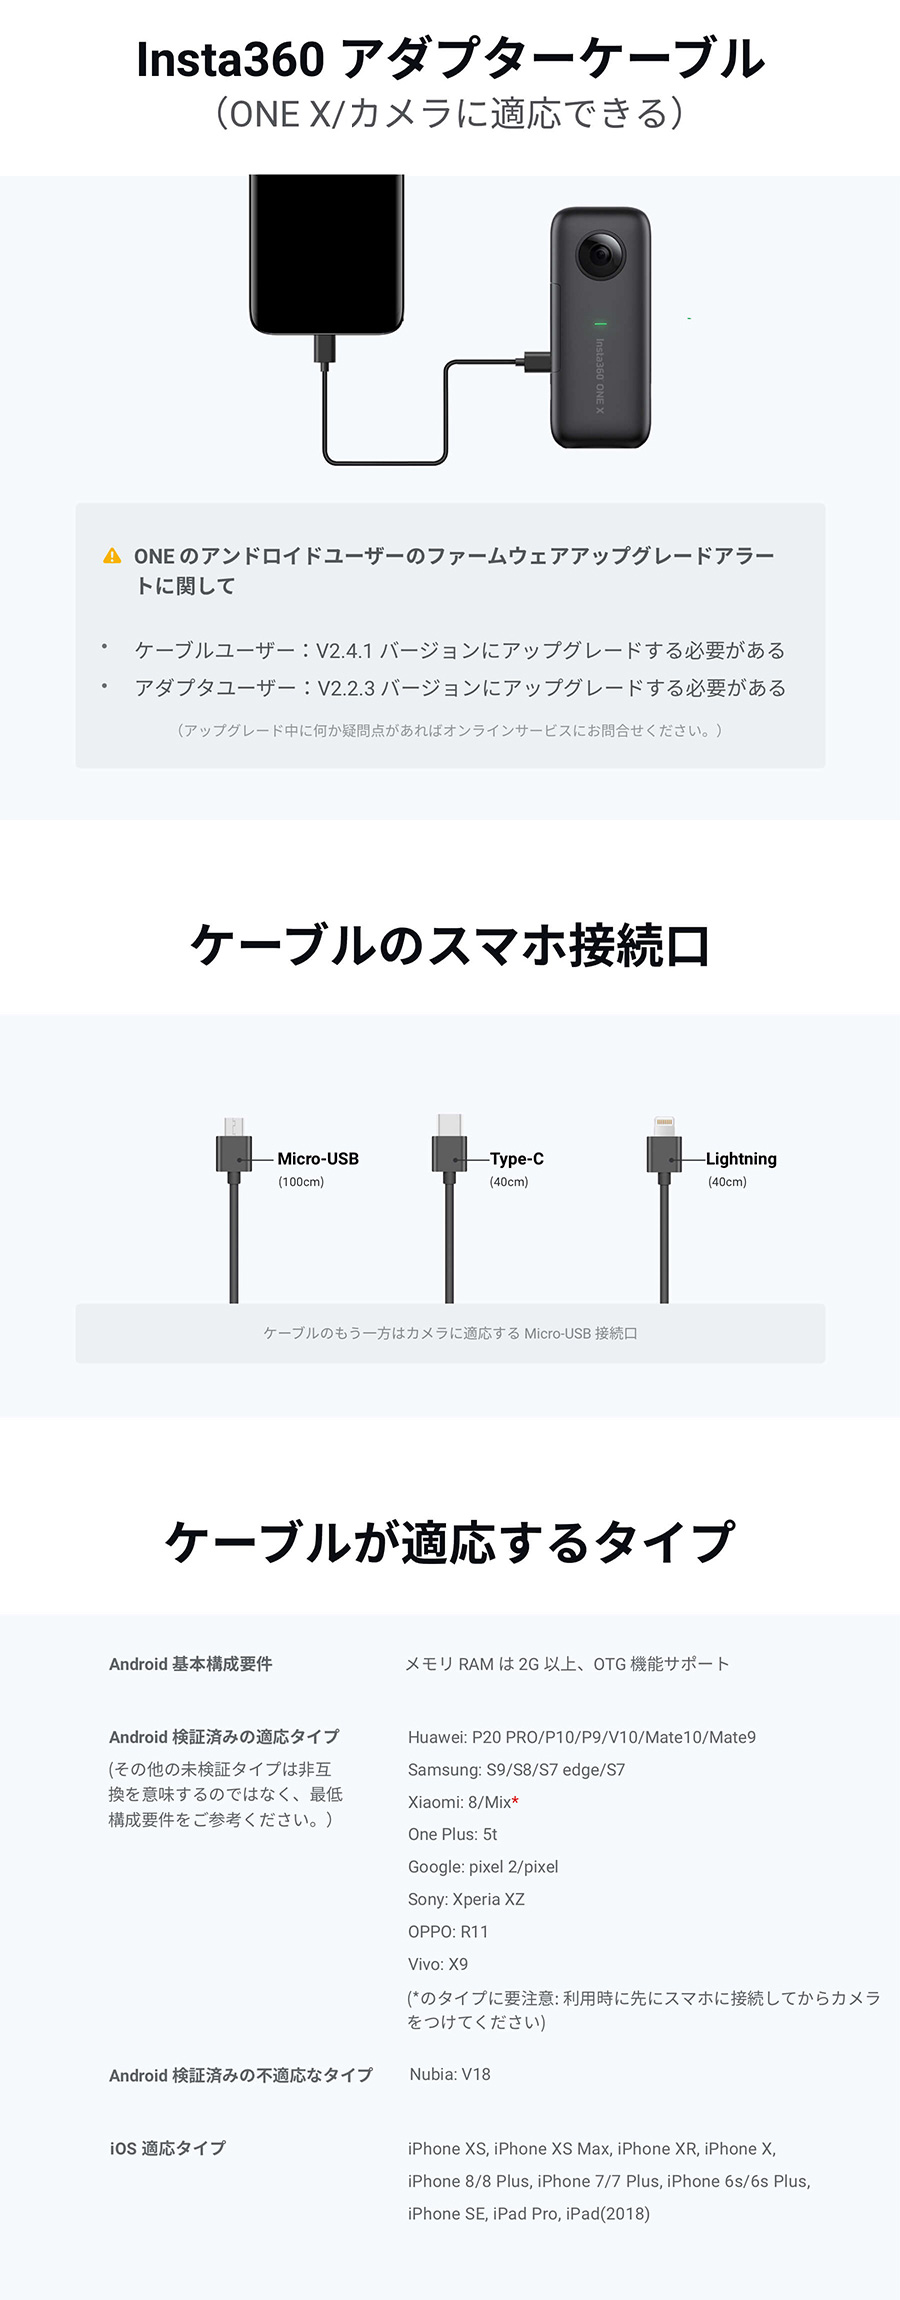 Insta360 アダプターケーブル Android (ONE X & ONE) | Android用 USB-C ケーブル